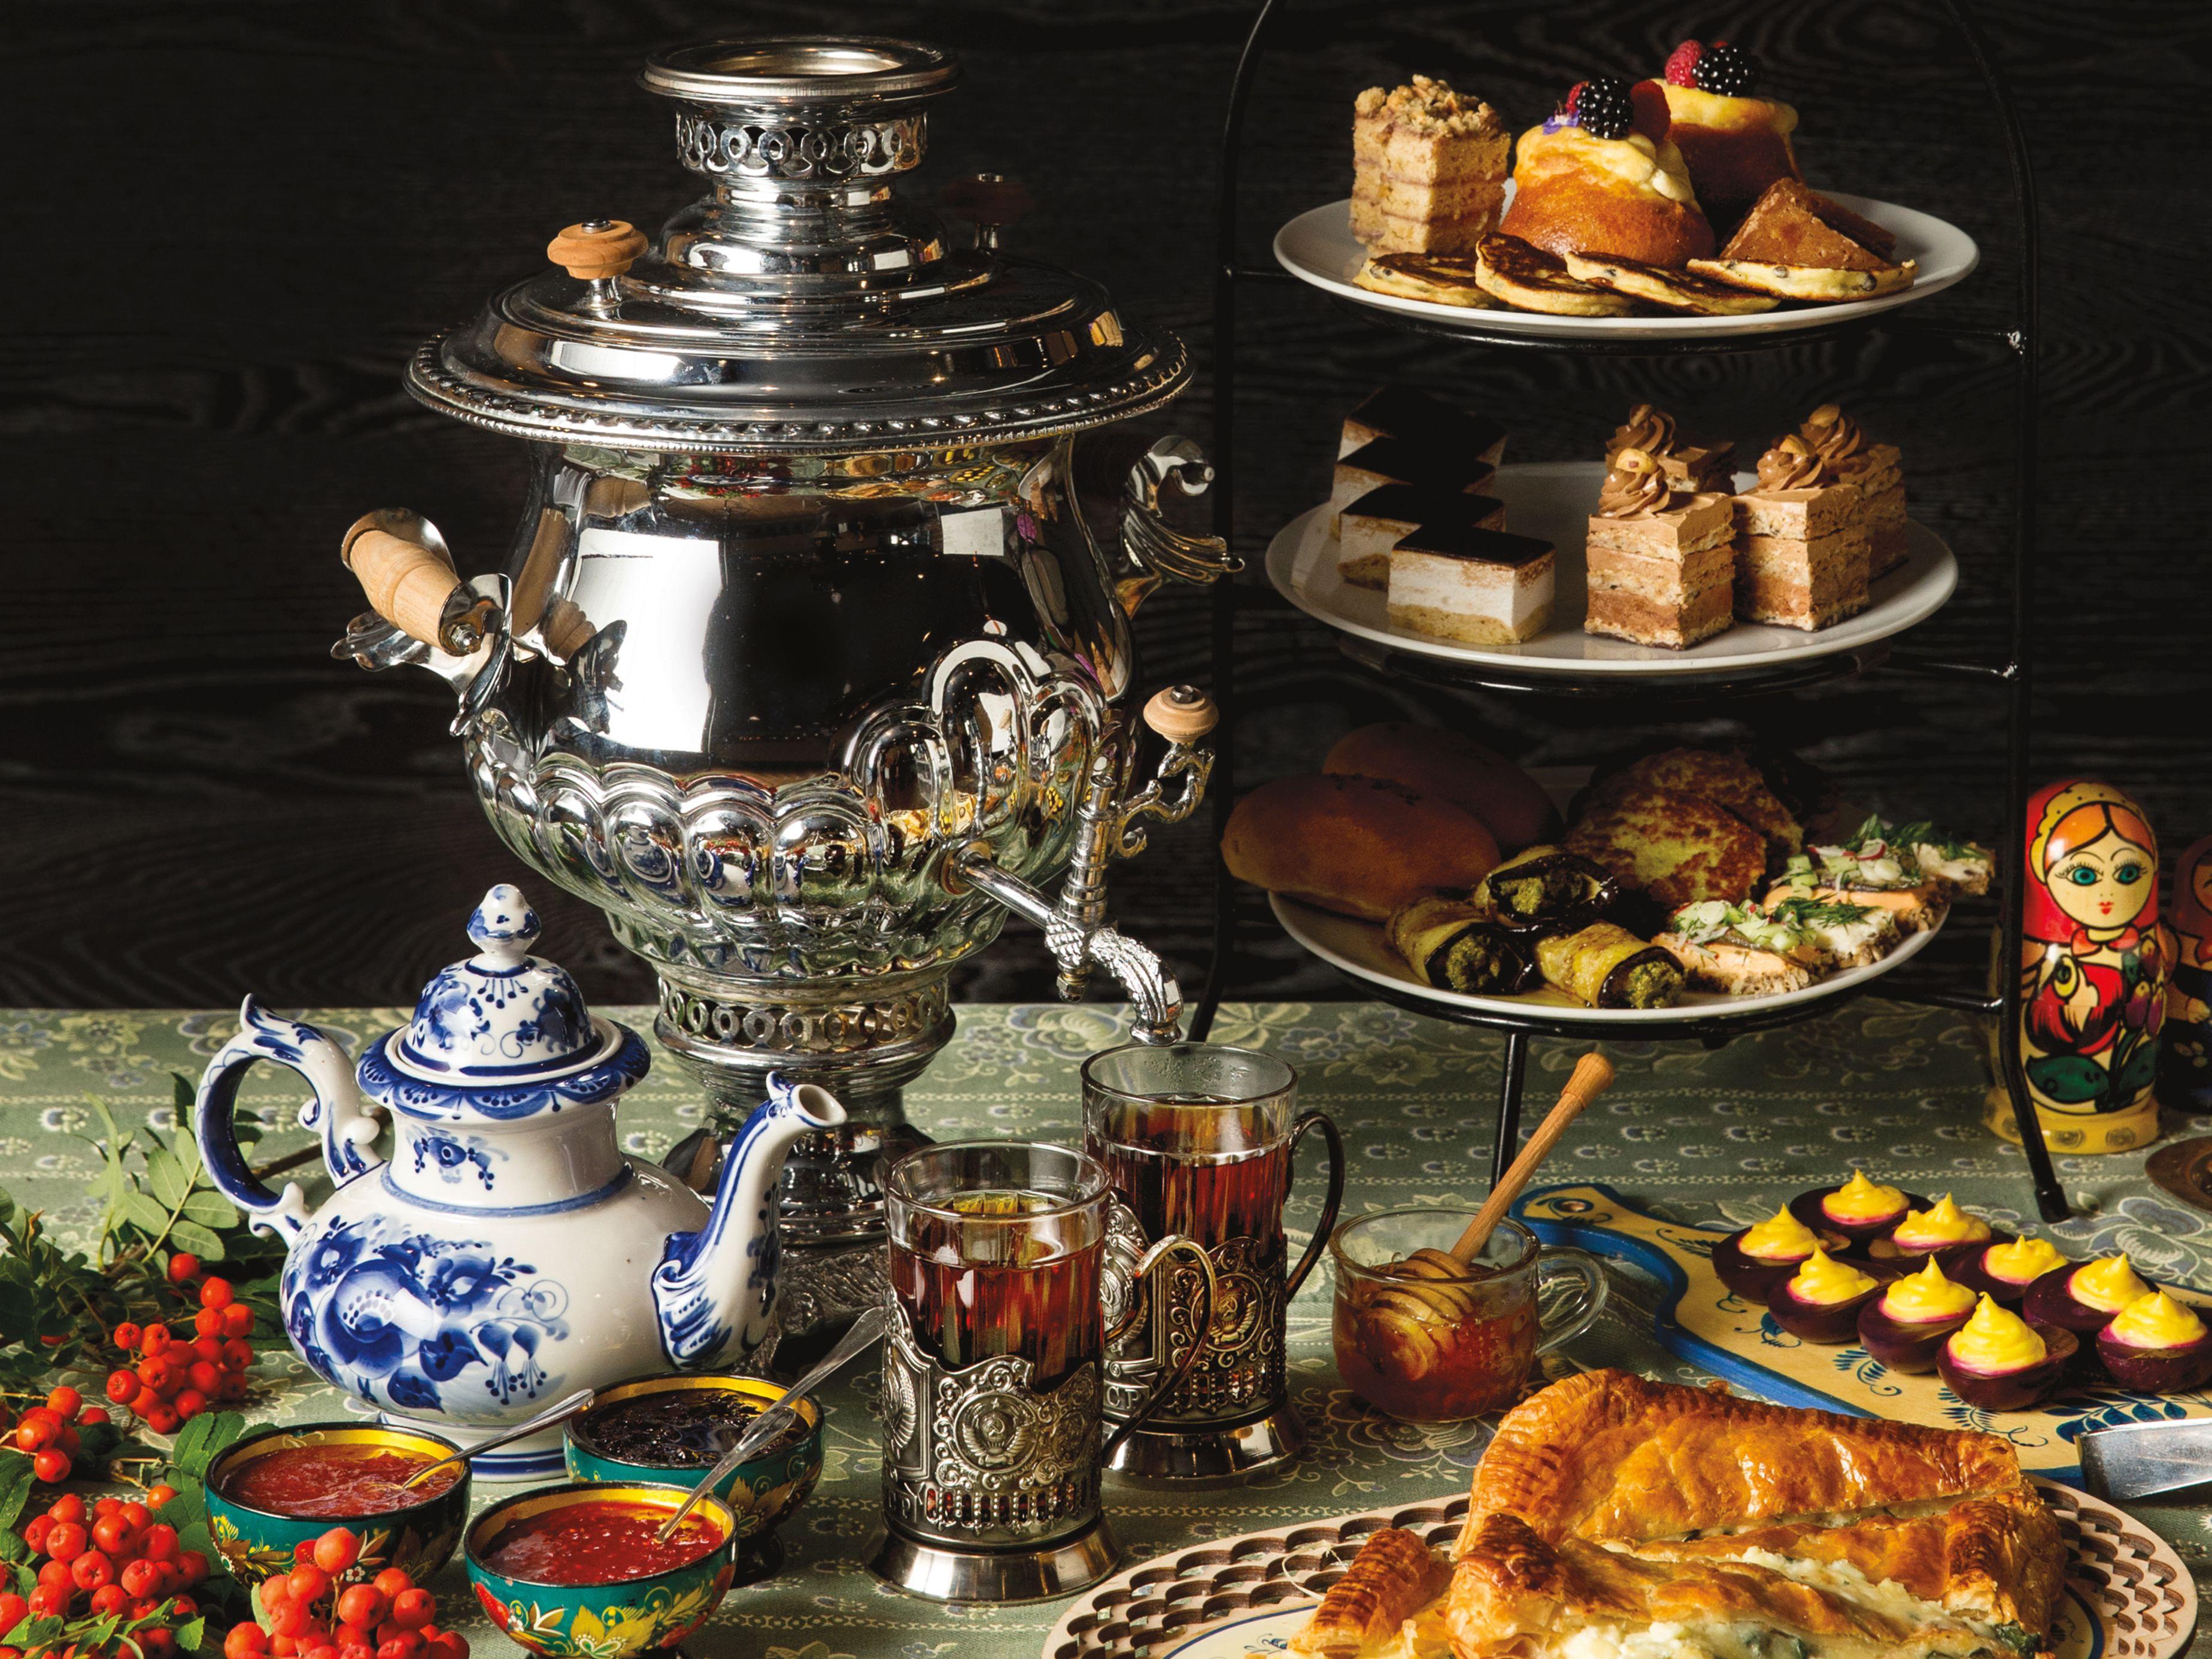 Pomo 0217 paleys russian tea heathman accuhm